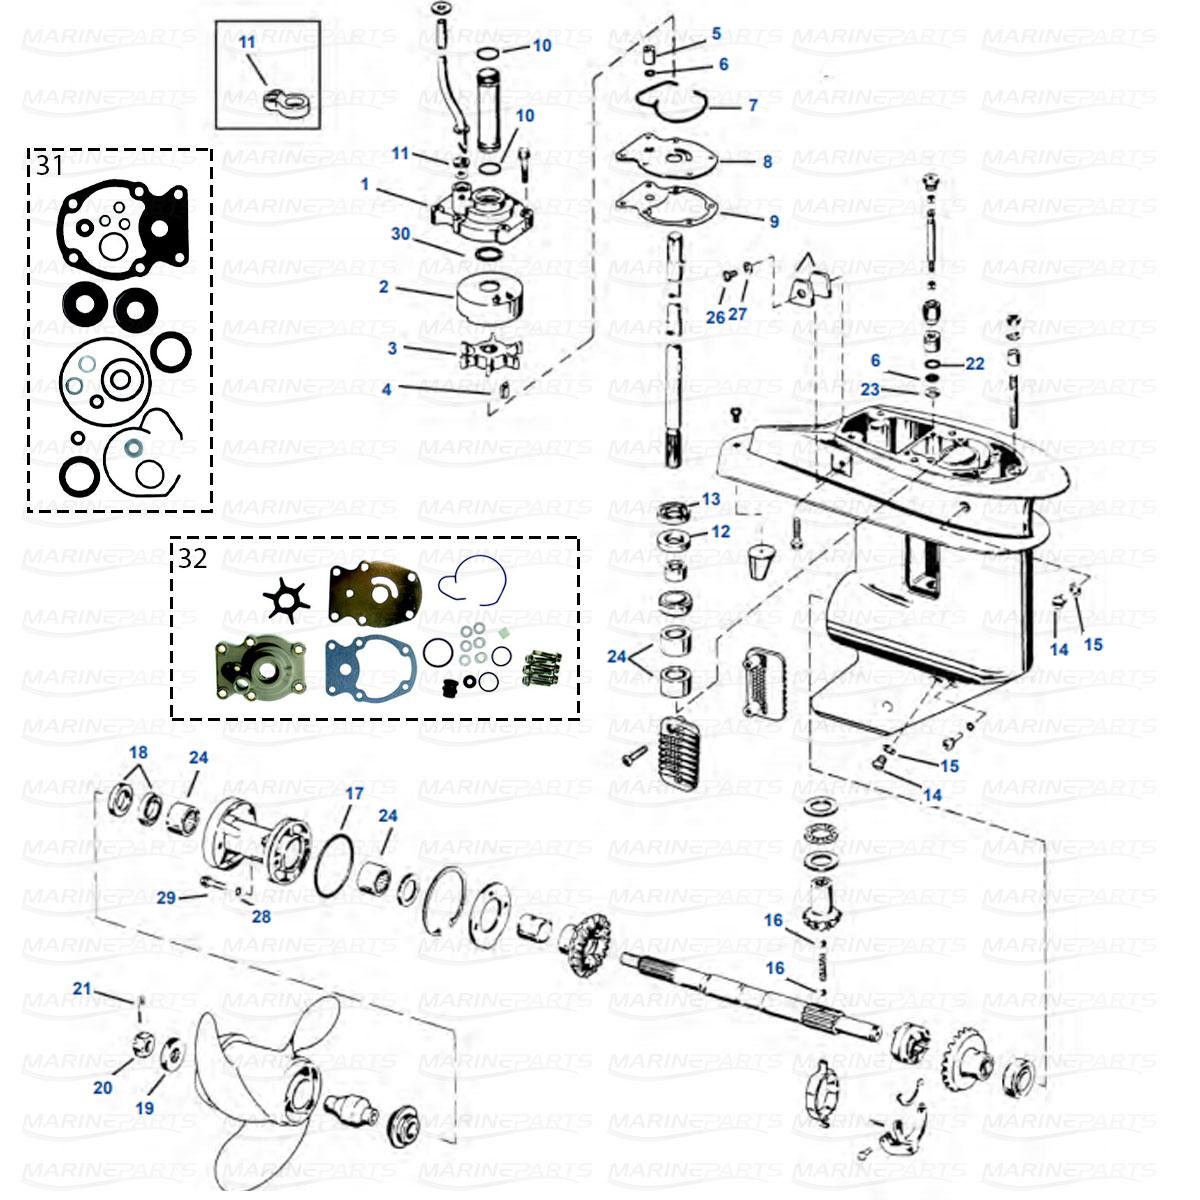 Gearcase parts 20-35 HP 1980-2001